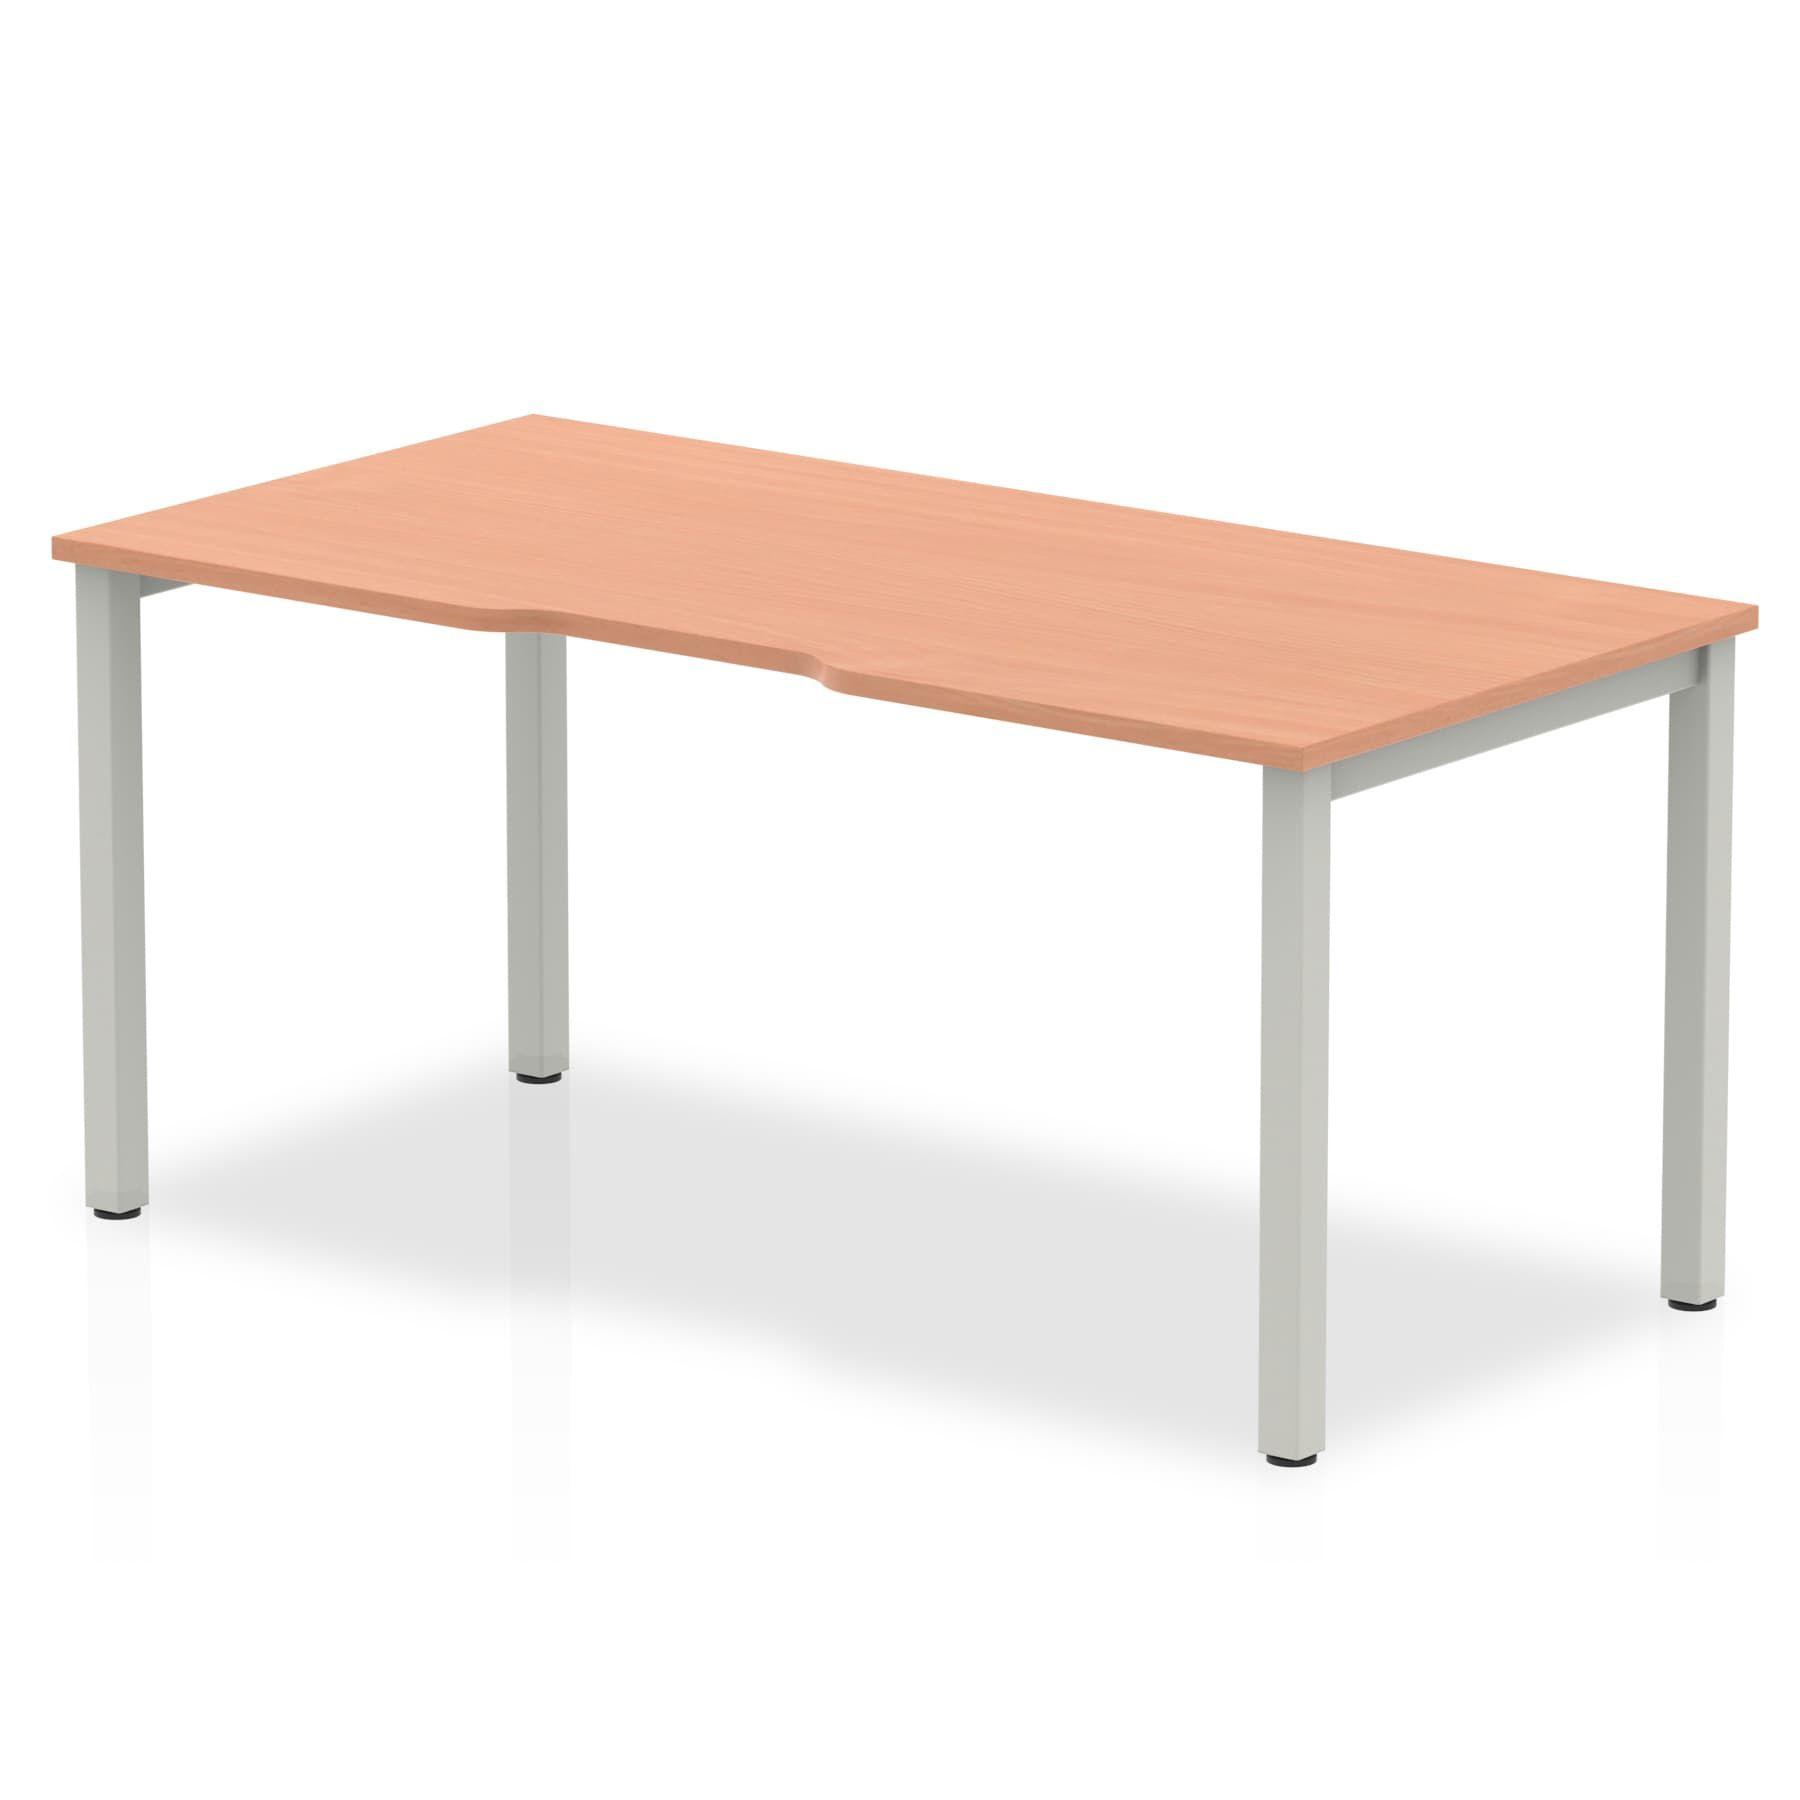 Single Silver/White Frame Bench Desk 1200